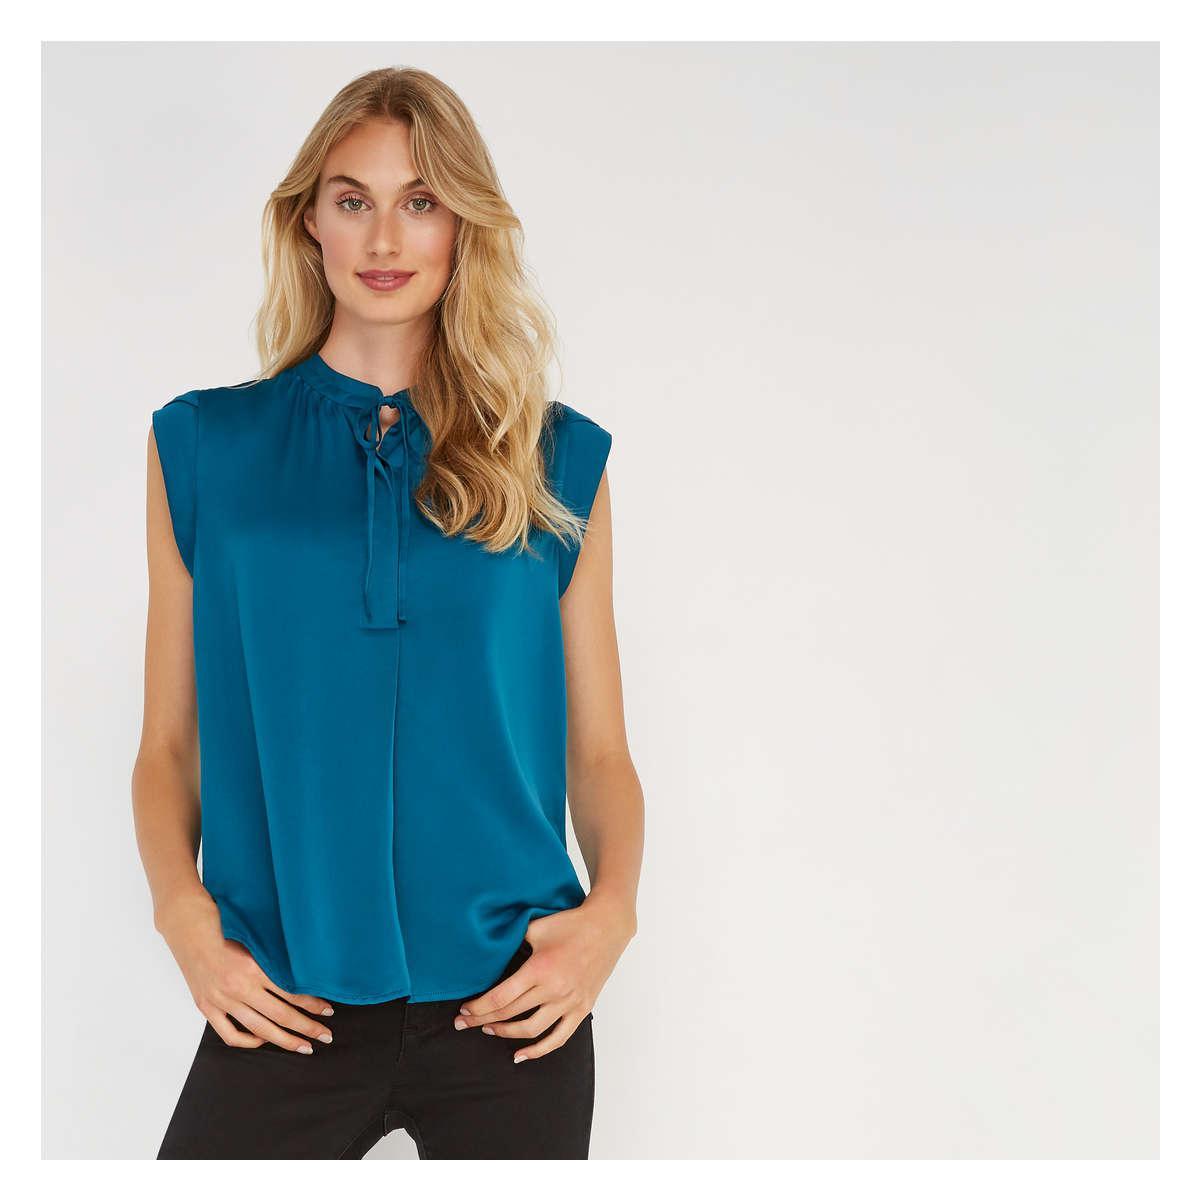 706254f83e2c9 Lyst - Joe Fresh Tie Neck Sleeveless Blouse in Blue